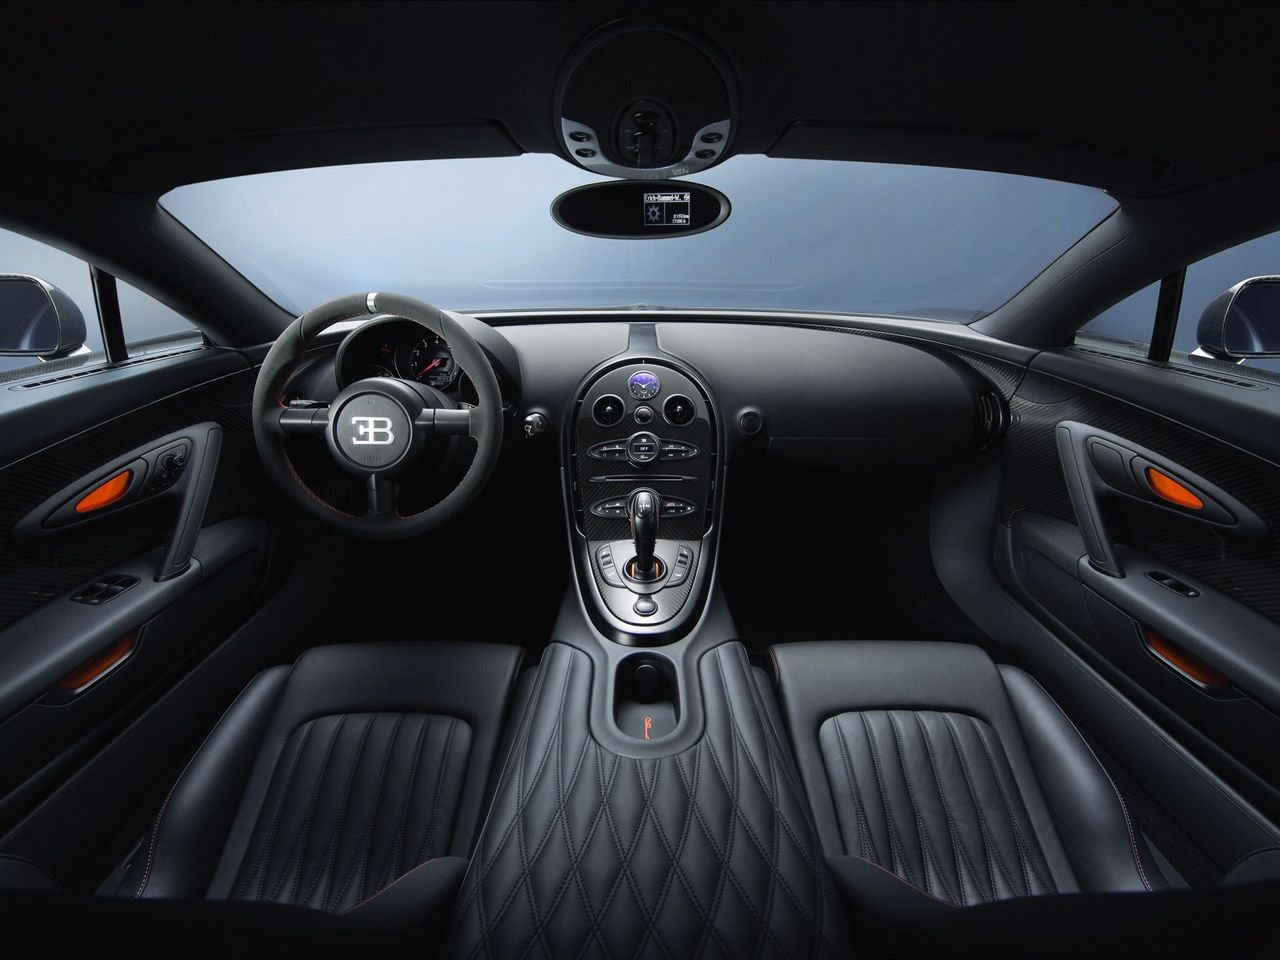 Front View Bugatti Veyron Super Sport Bugatti Veyron 16 Bugatti Cars